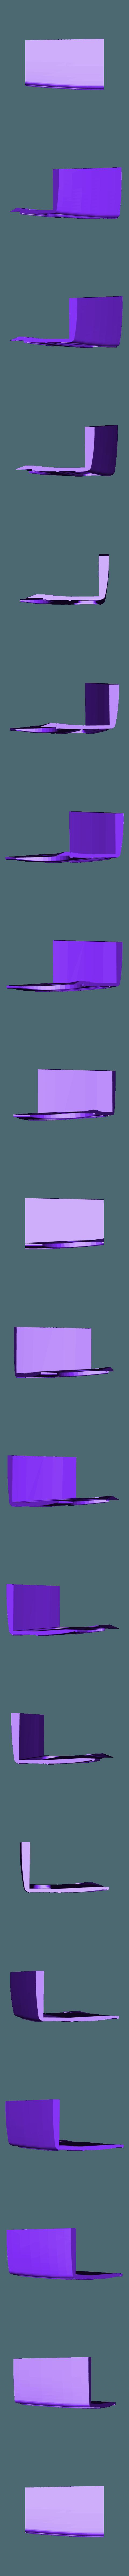 hotrod flanc  3.stl Download STL file Fury road hotrod bodyshell 1/10 • 3D printing design, RCGANG93